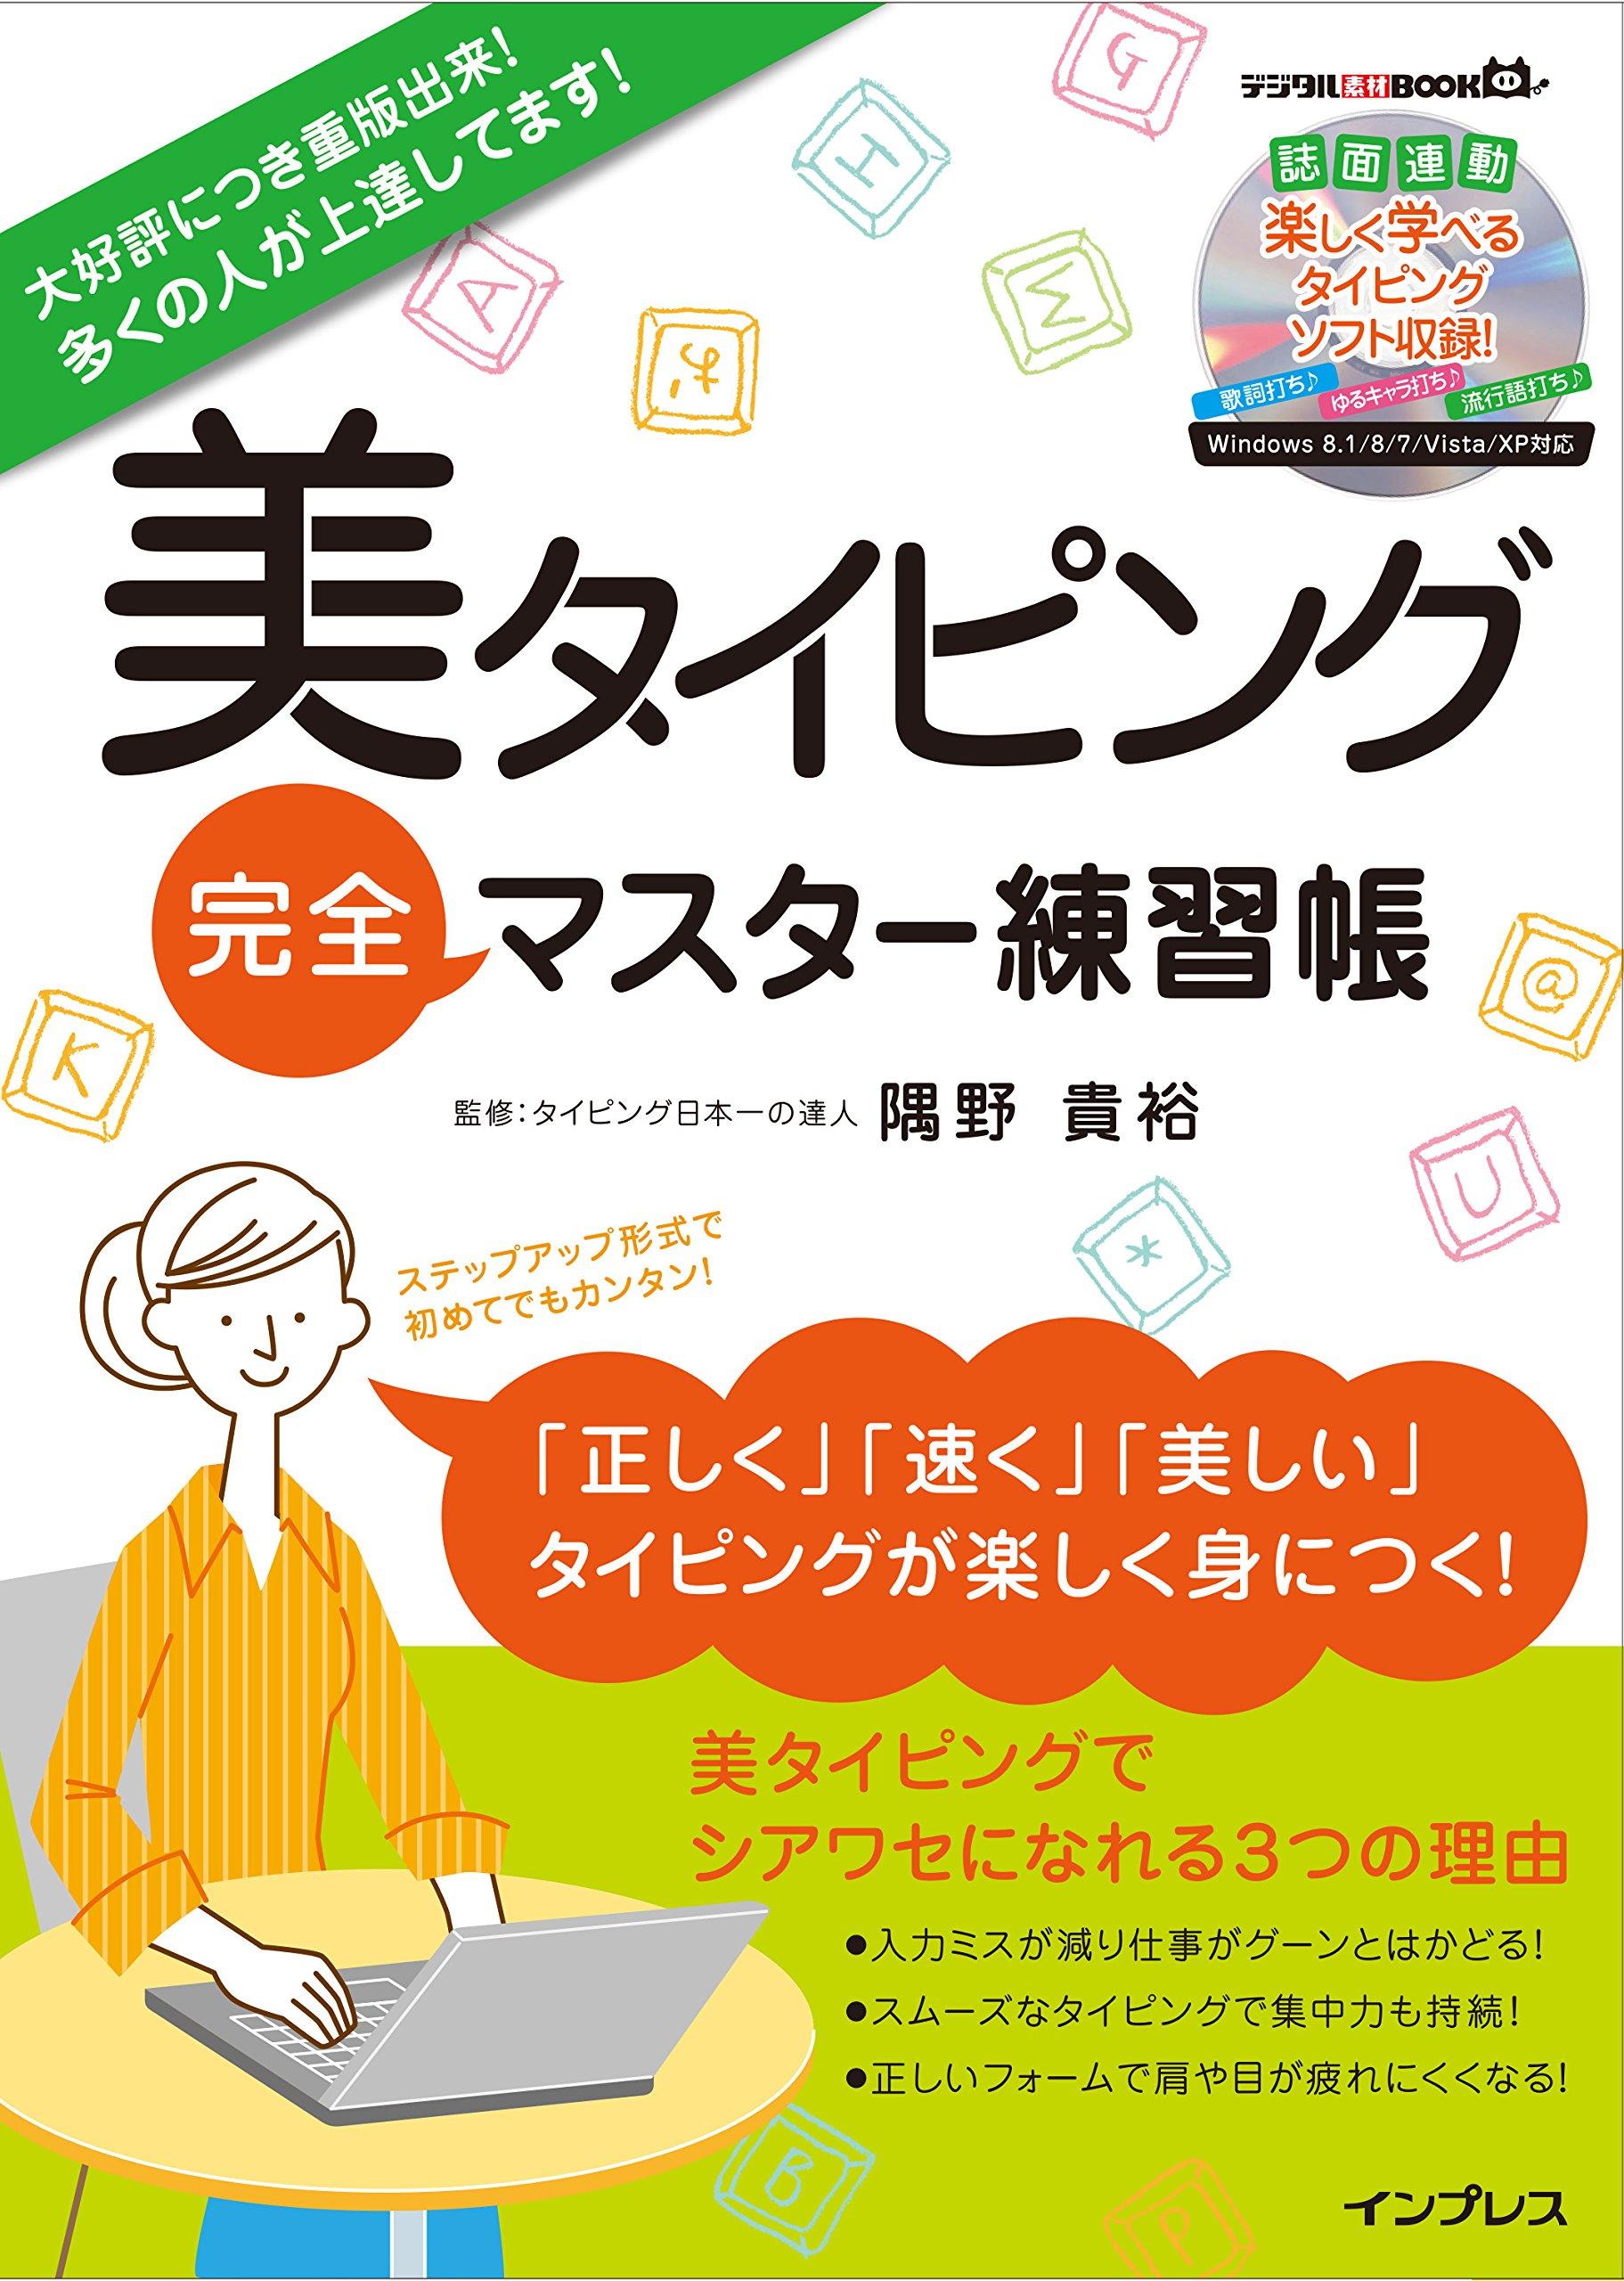 6264cde111 (CD-ROM付)美タイピング完全マスター練習帳 (ijデジタルBOOK) | 隅野貴裕 |本 | 通販 | Amazon